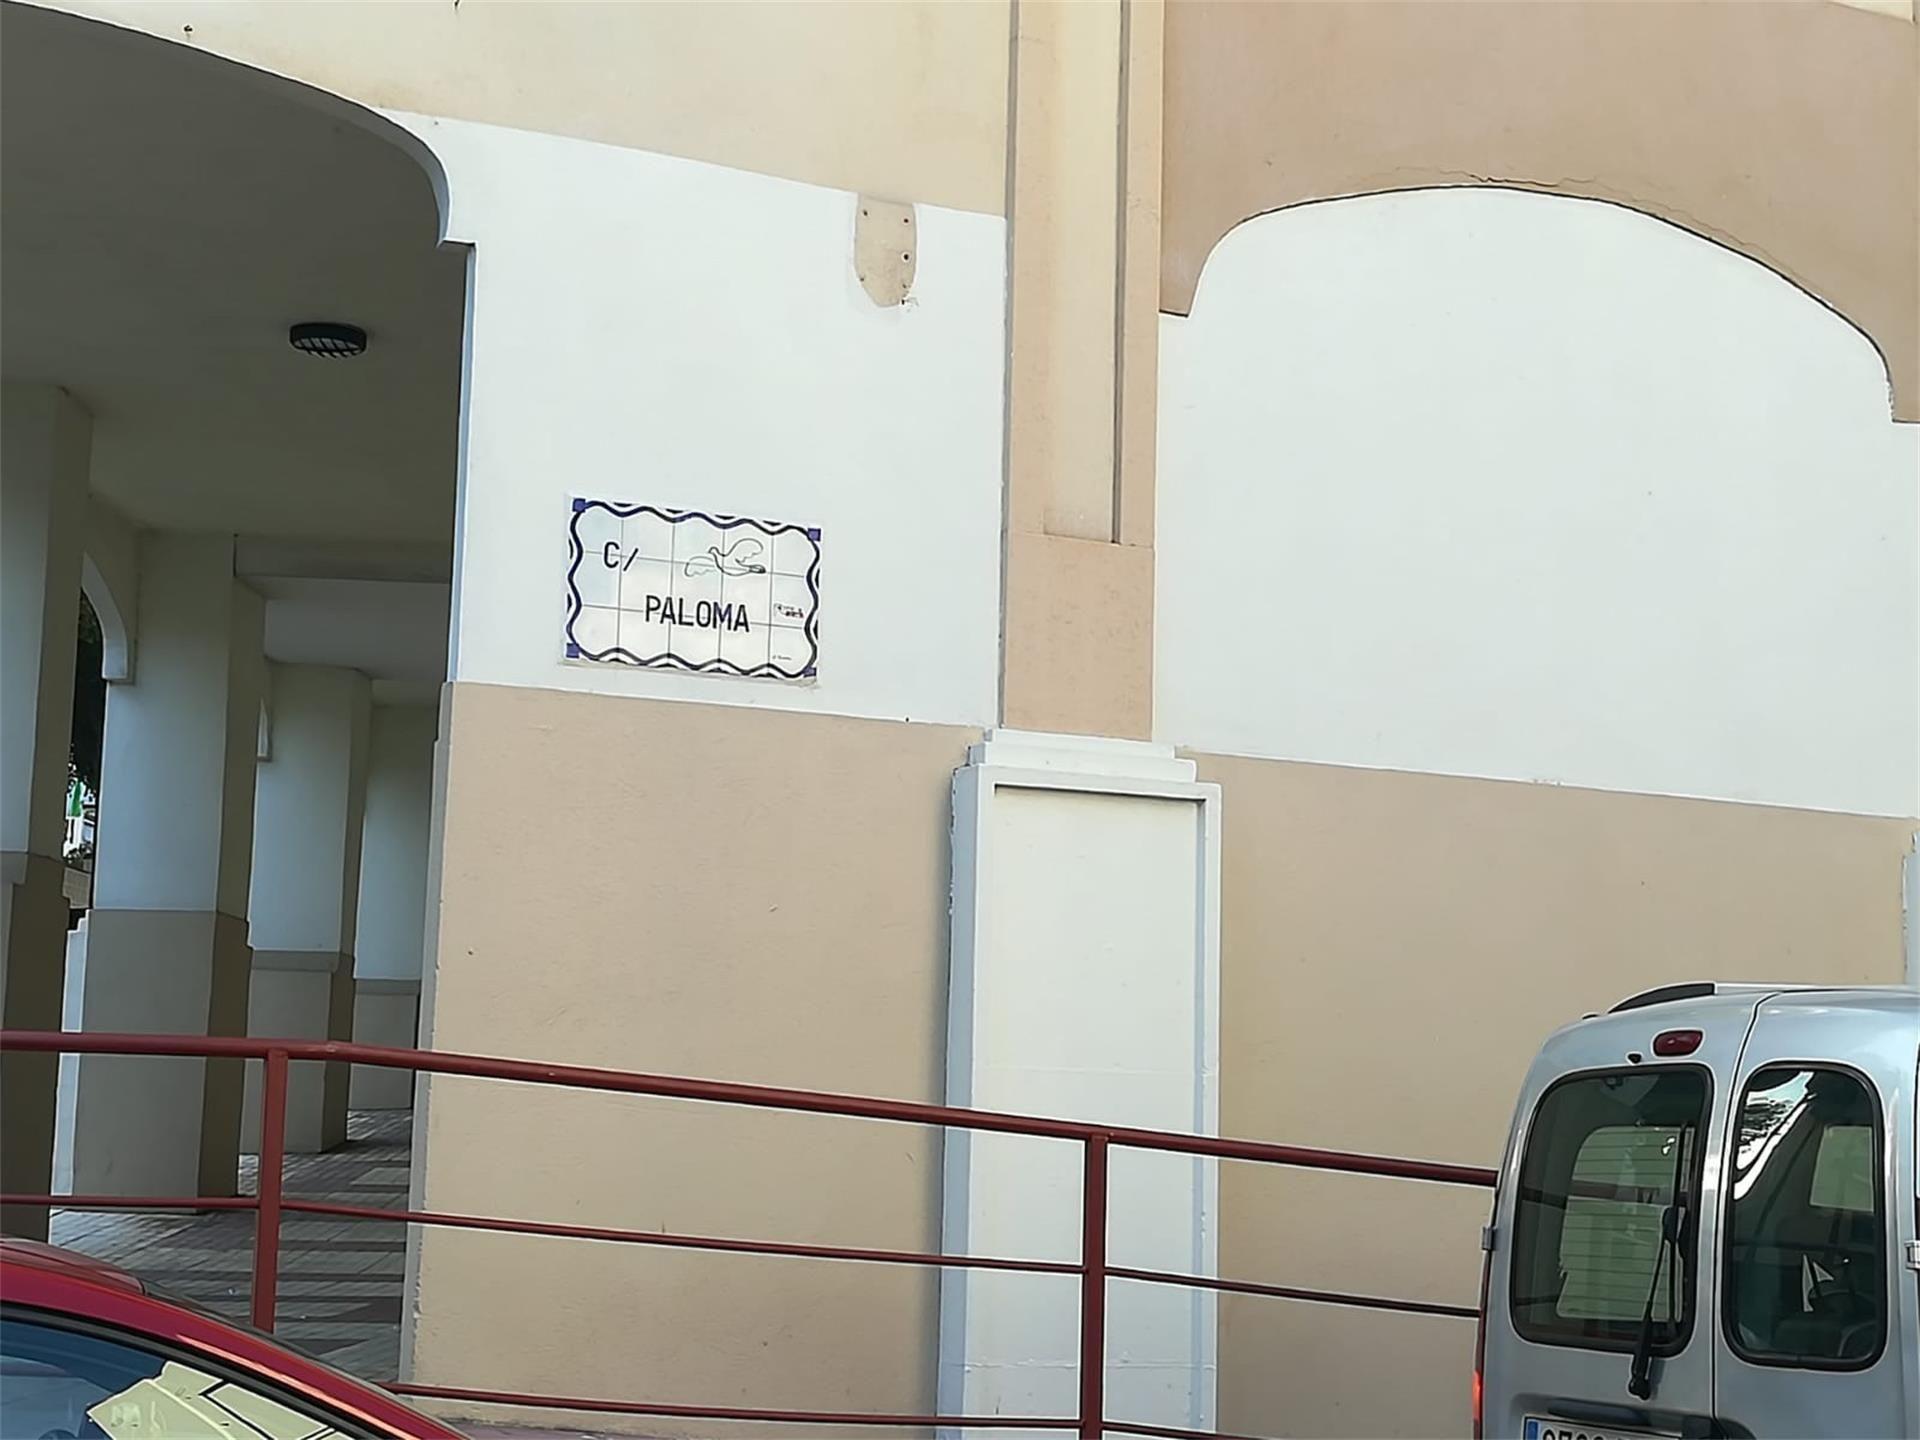 Local de alquiler en Calle Paloma, 2, Arroyo de la Miel (Benalmádena, Málaga)